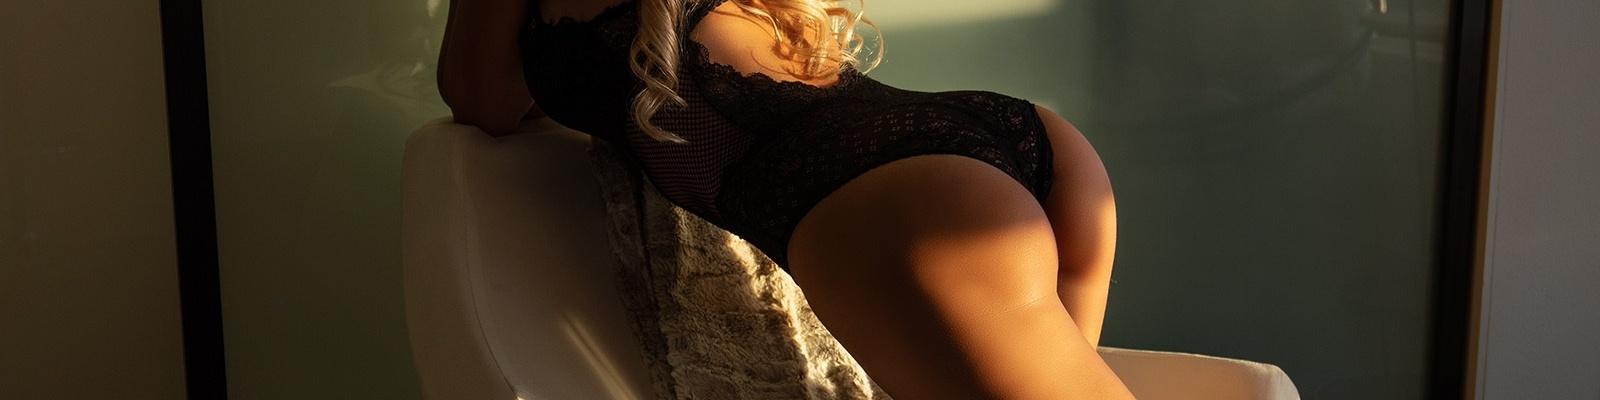 Amelia Voss's Cover Photo